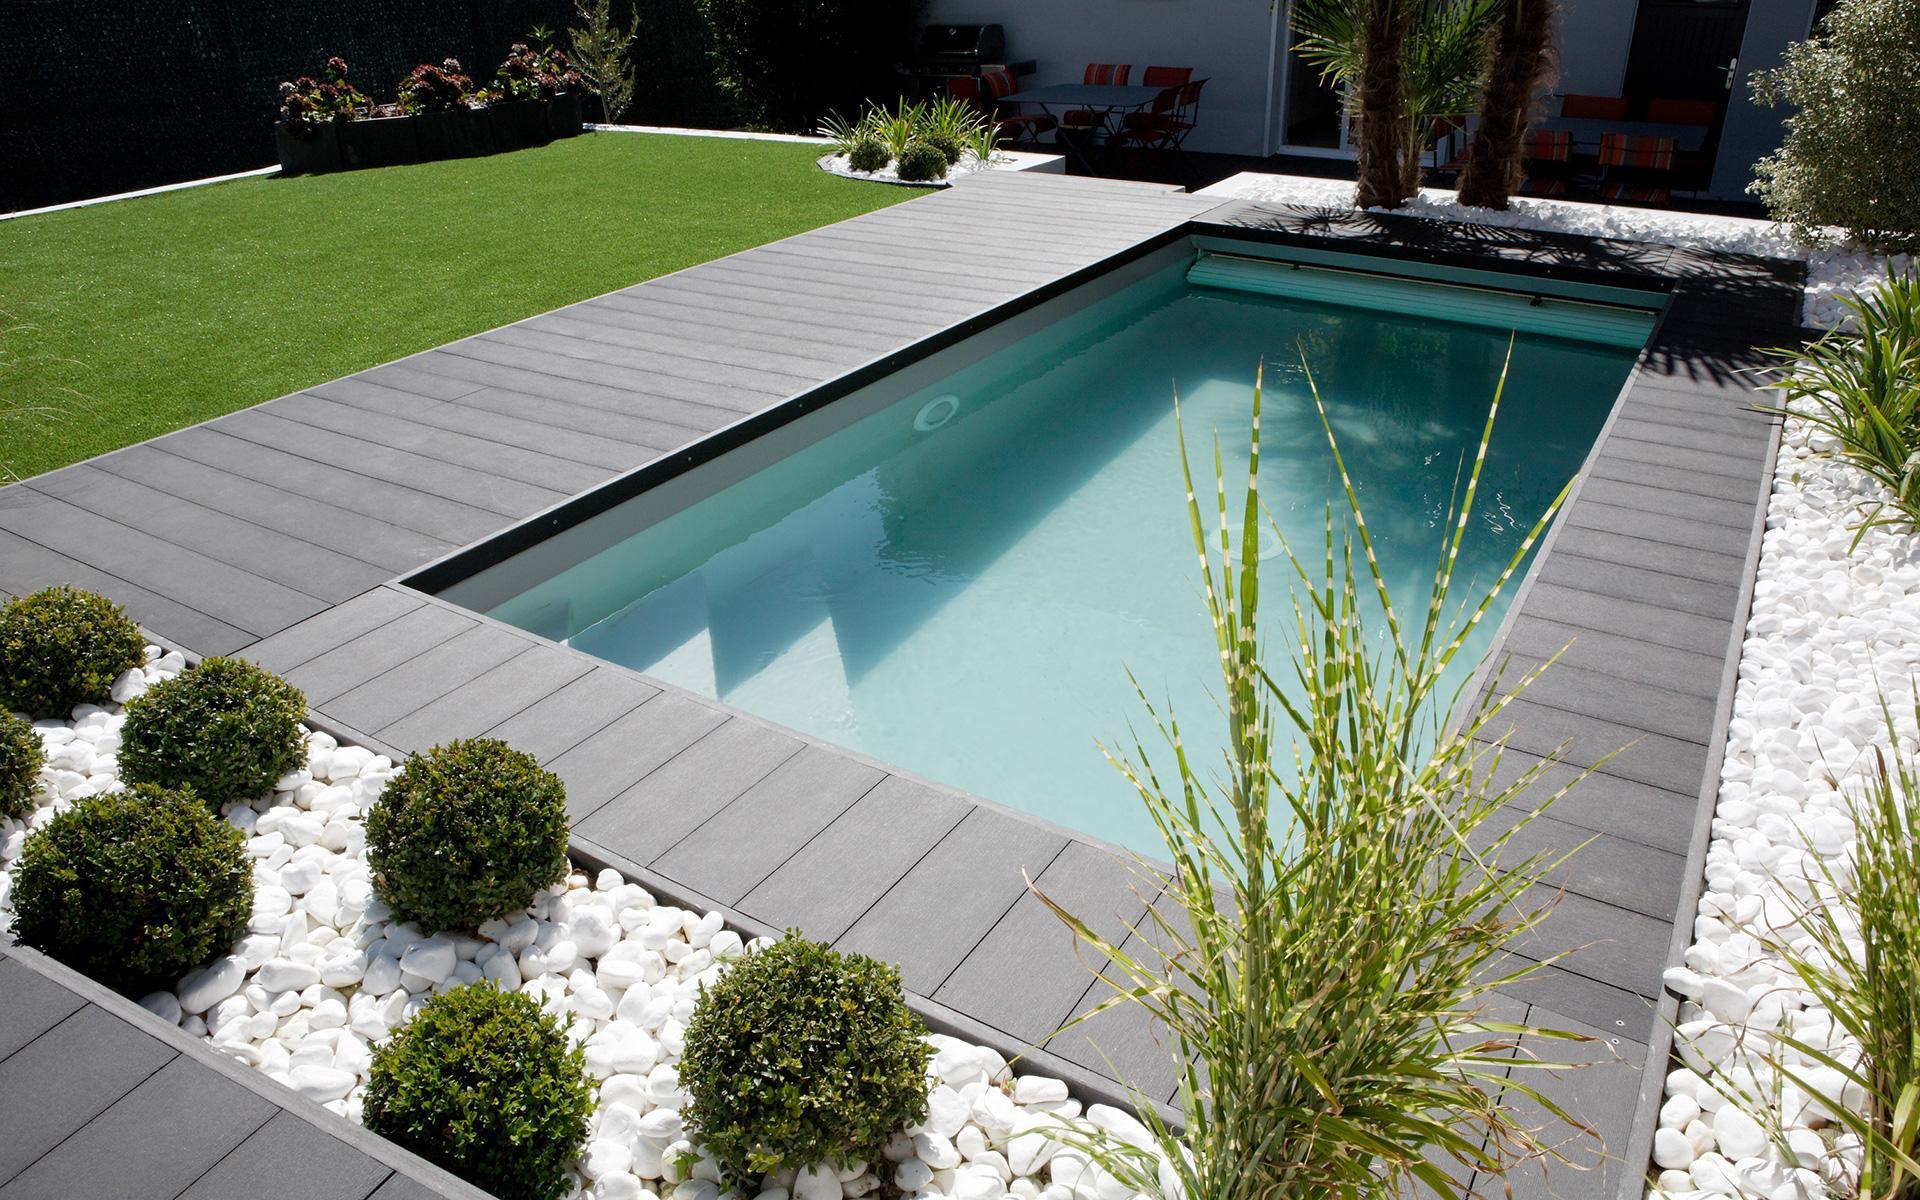 Idee Amenagement Tour De Piscine amenagement tour de piscine piscine david paysage - idees